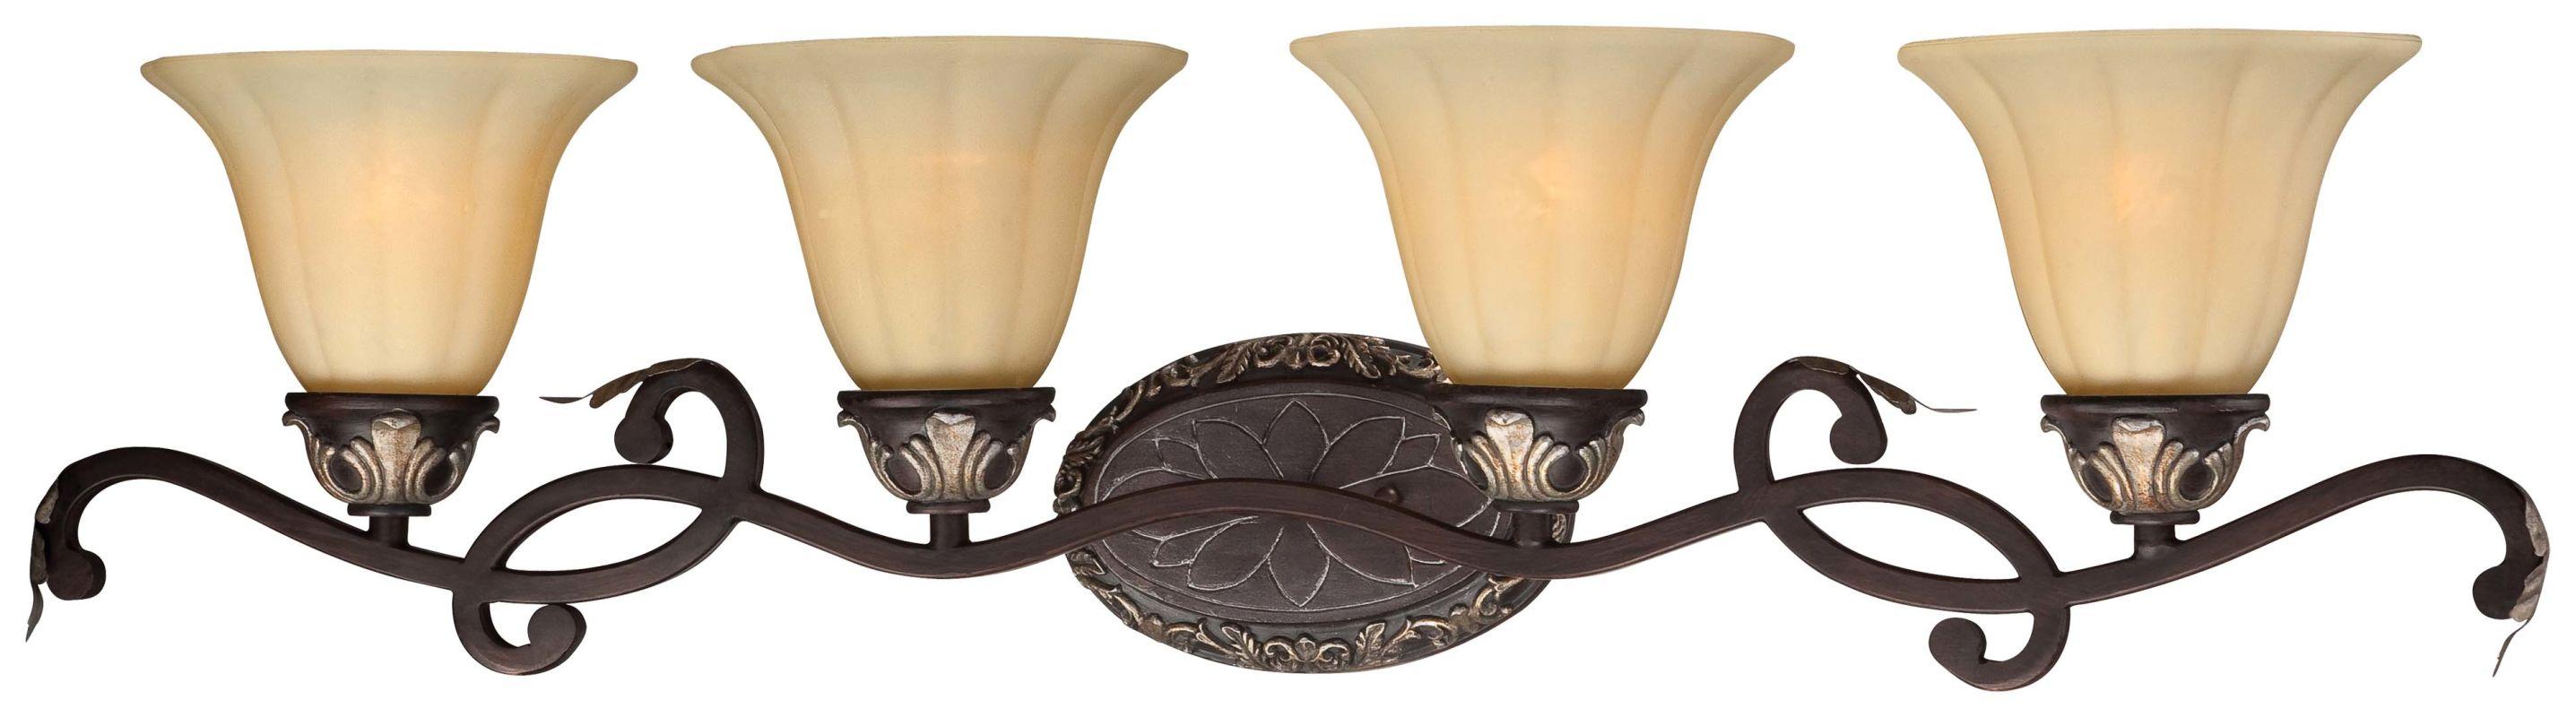 Minka Lavery 5774 4 Light Bathroom Vanity Light from the Bellasera Sale $259.90 ITEM: bci1950841 ID#:5774-301 UPC: 747396082172 :